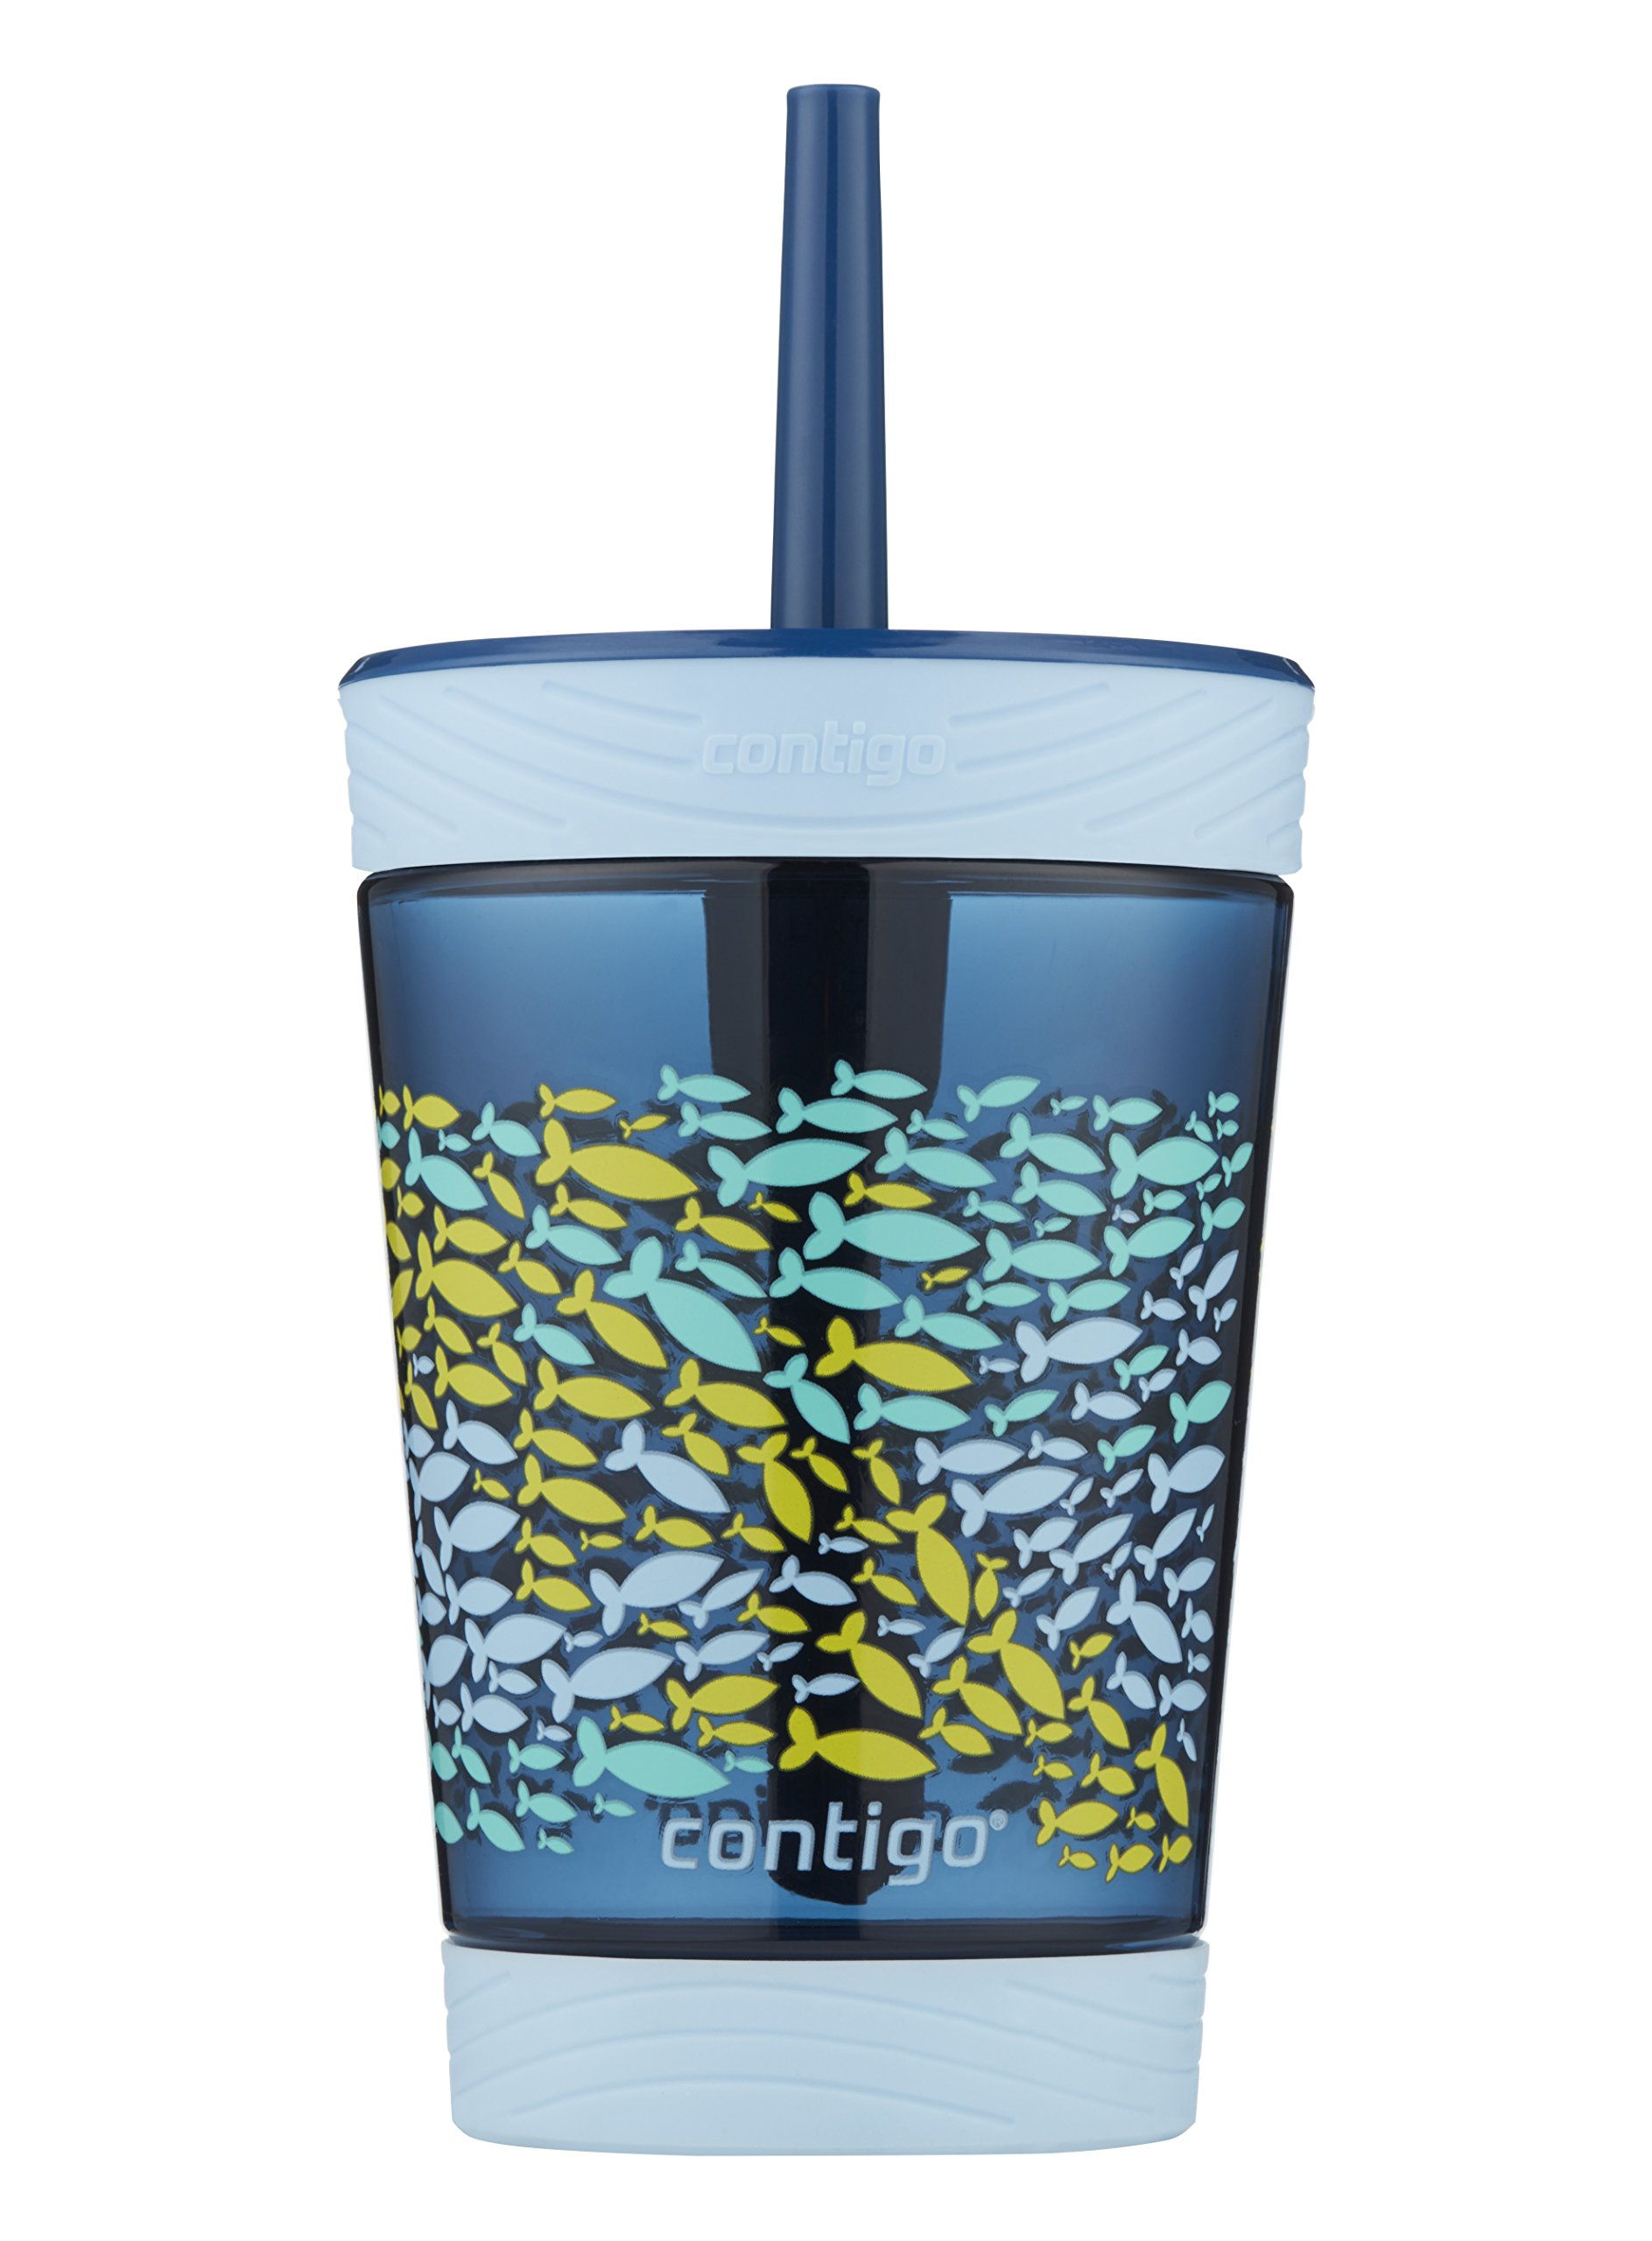 Contigo Kids Tumbler with Straw | Spill-Proof Tumbler with Straw for Kids, 14oz, Nautical Blue